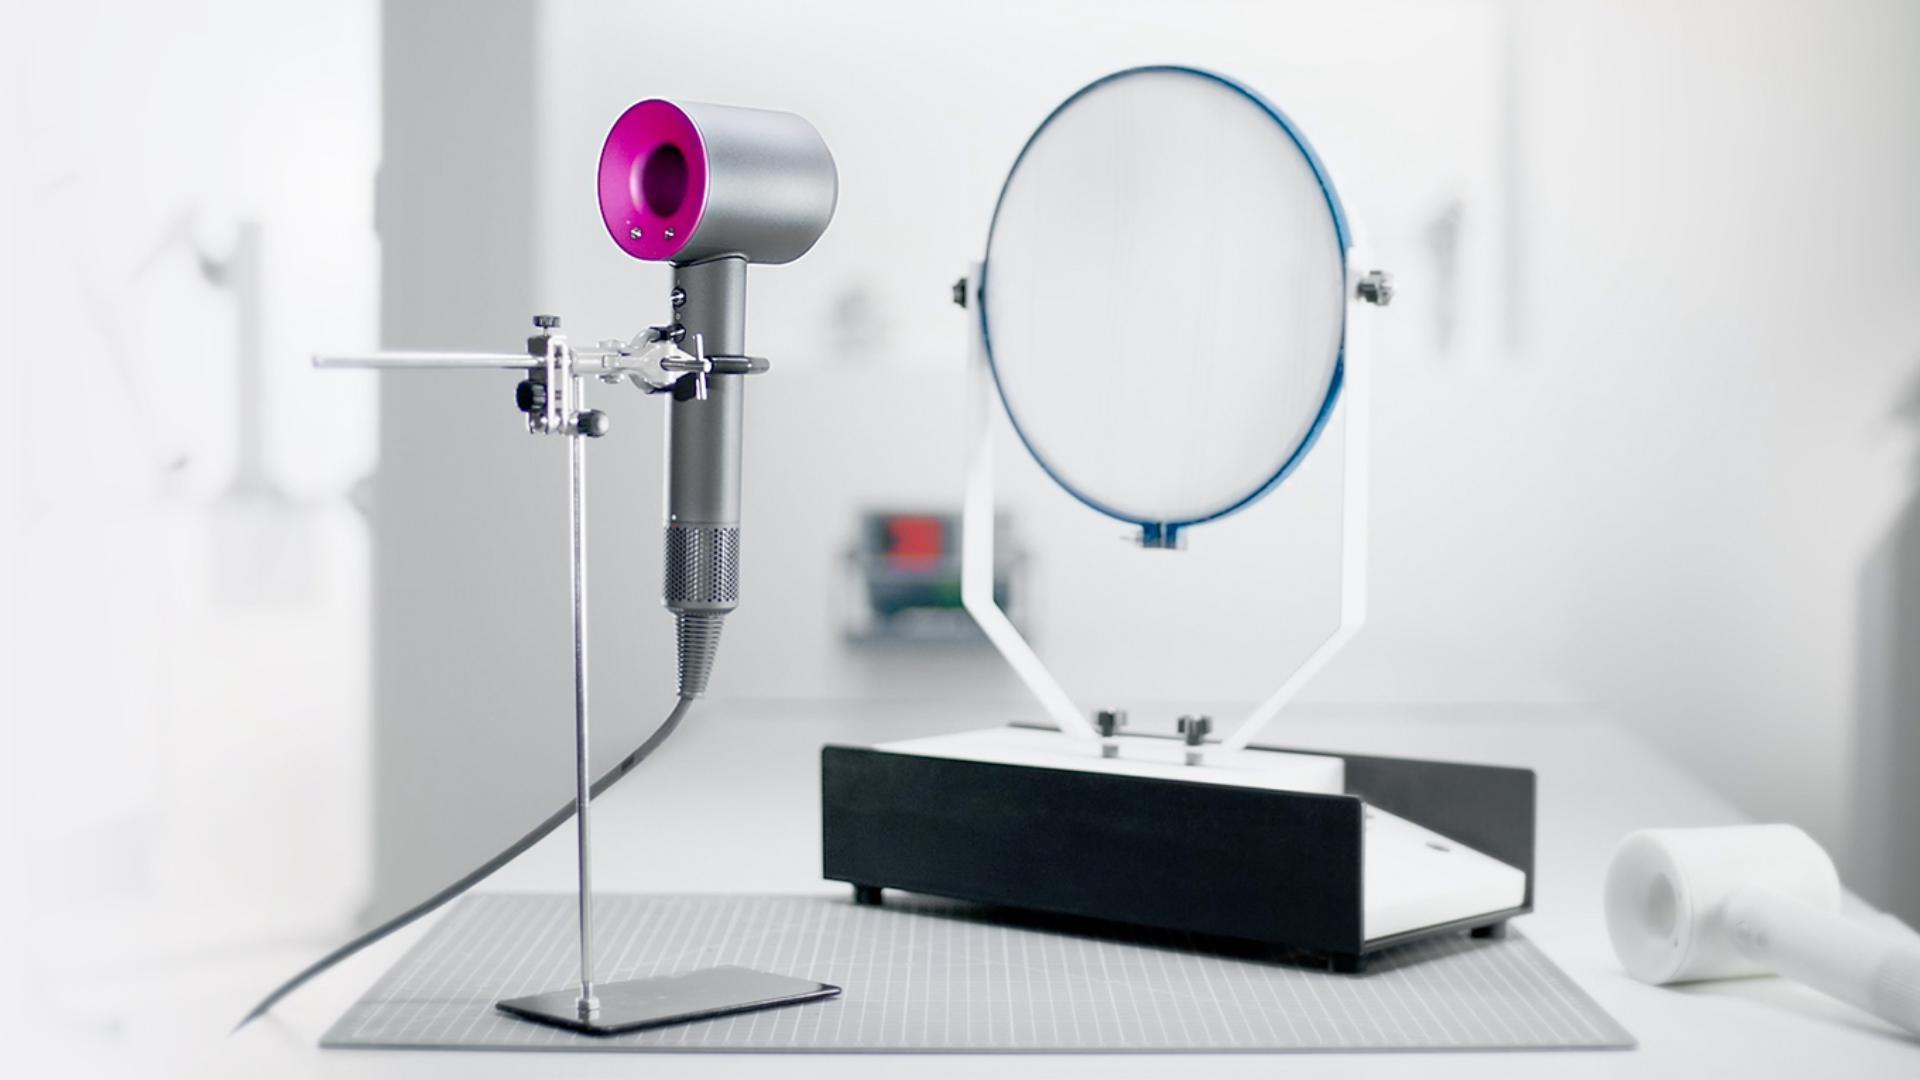 Dyson supersonic in laboratory.